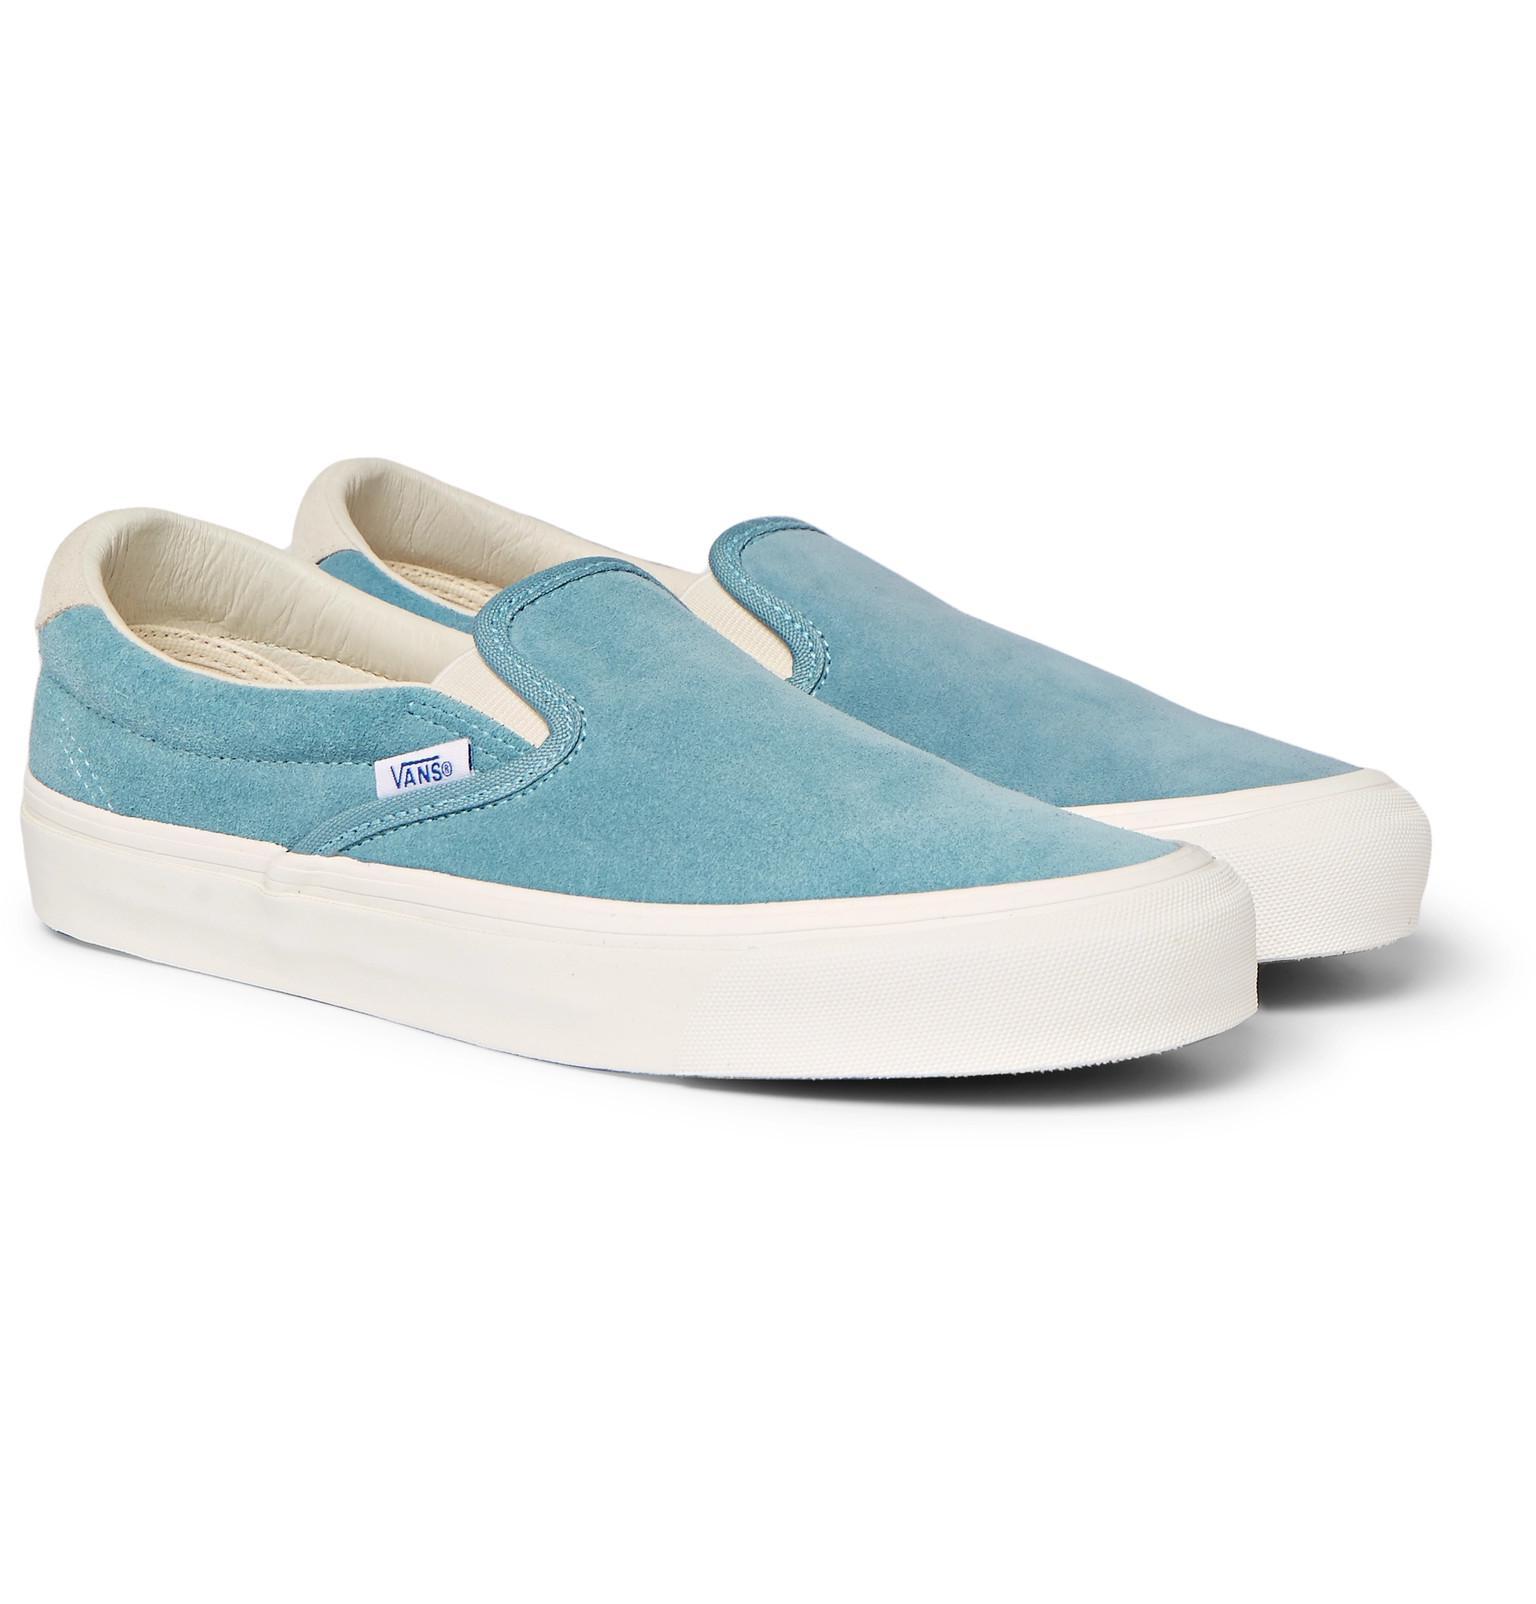 8dd87b1982 Lyst - Vans Og Classic Lx Suede Slip-on Sneakers in Blue for Men